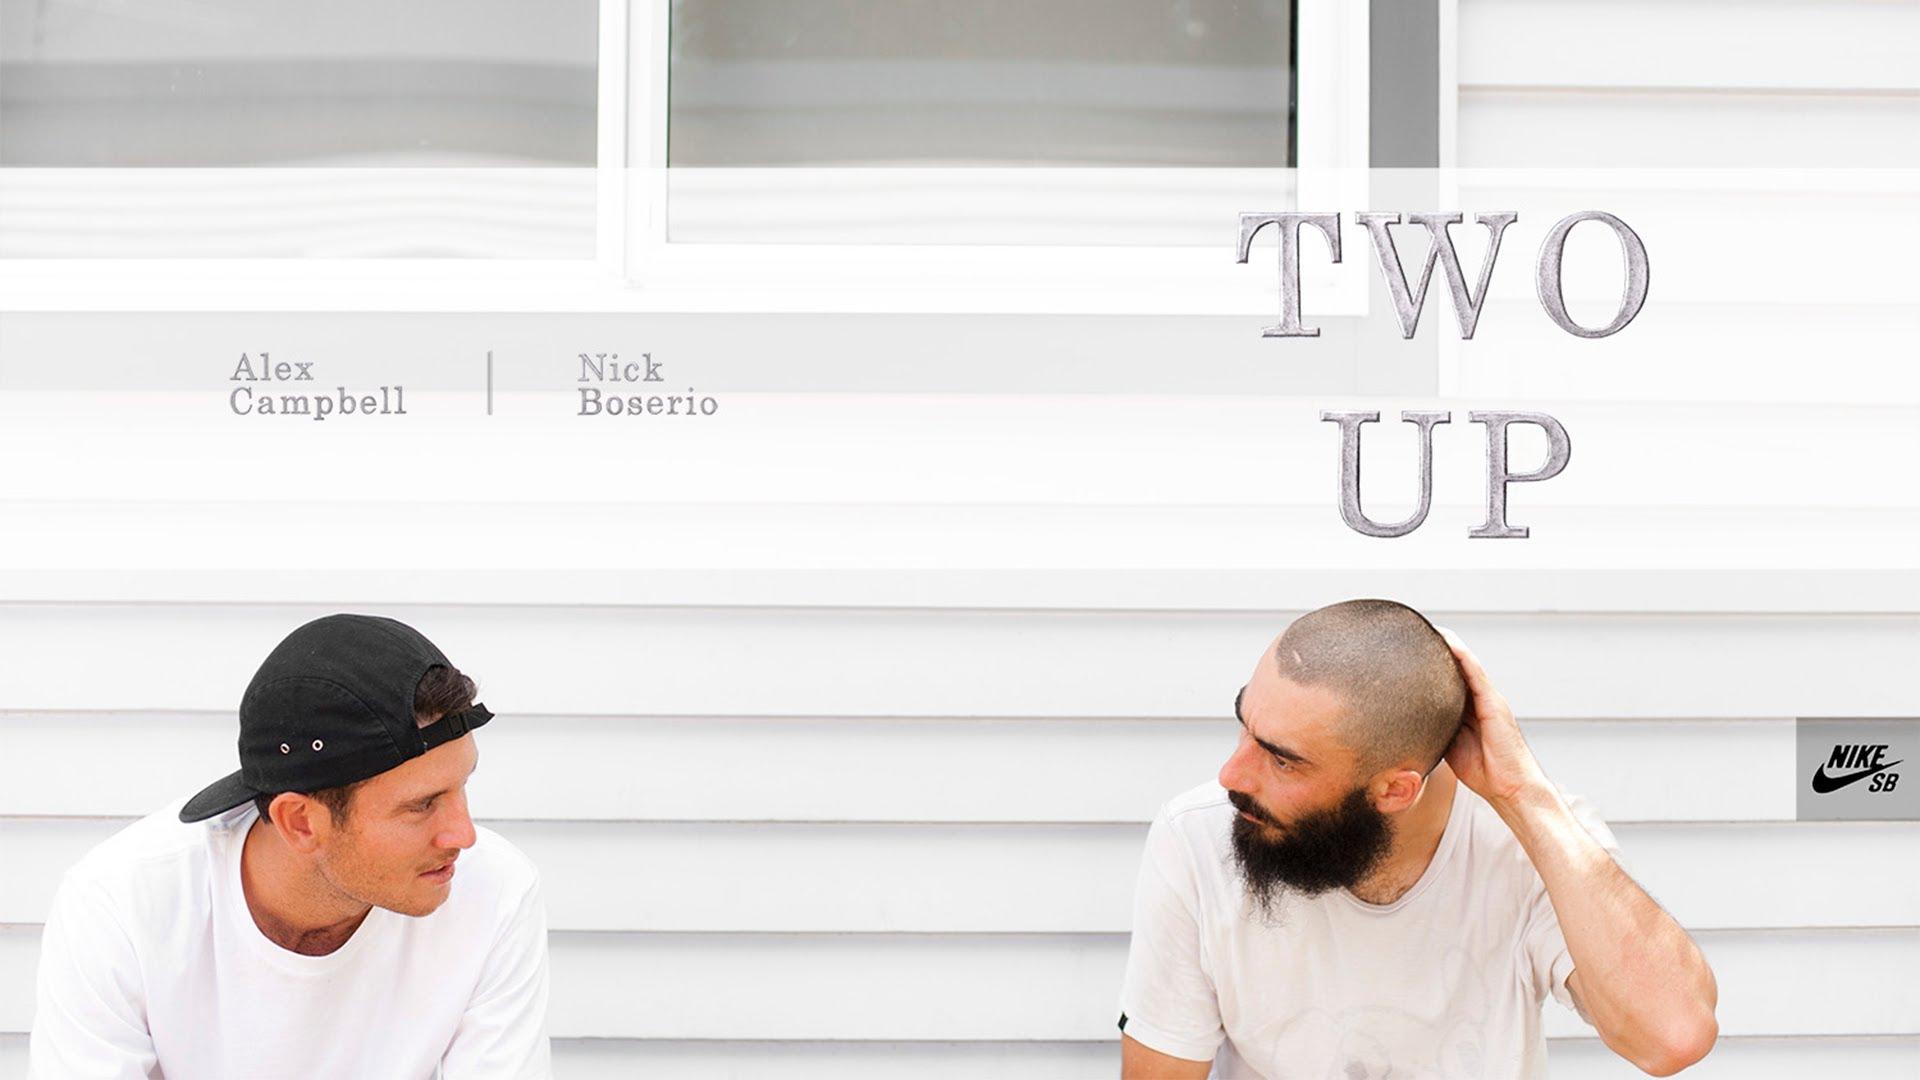 Nike SB Australia – Two Up Trailer